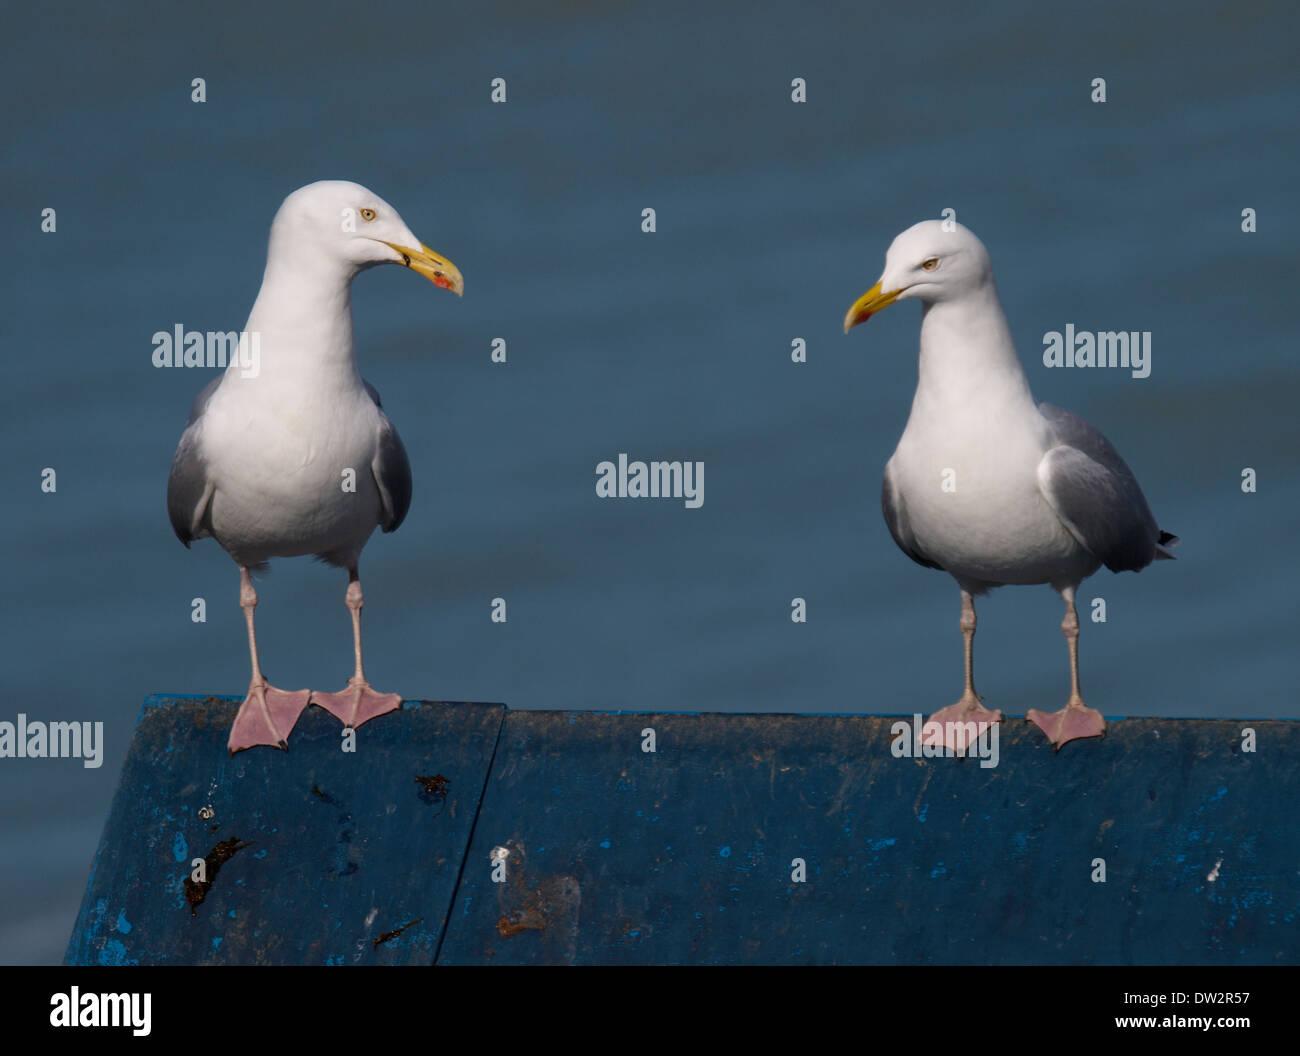 Two Herring gulls, Larus argentatus stood on a roof, Cornwall, UK - Stock Image